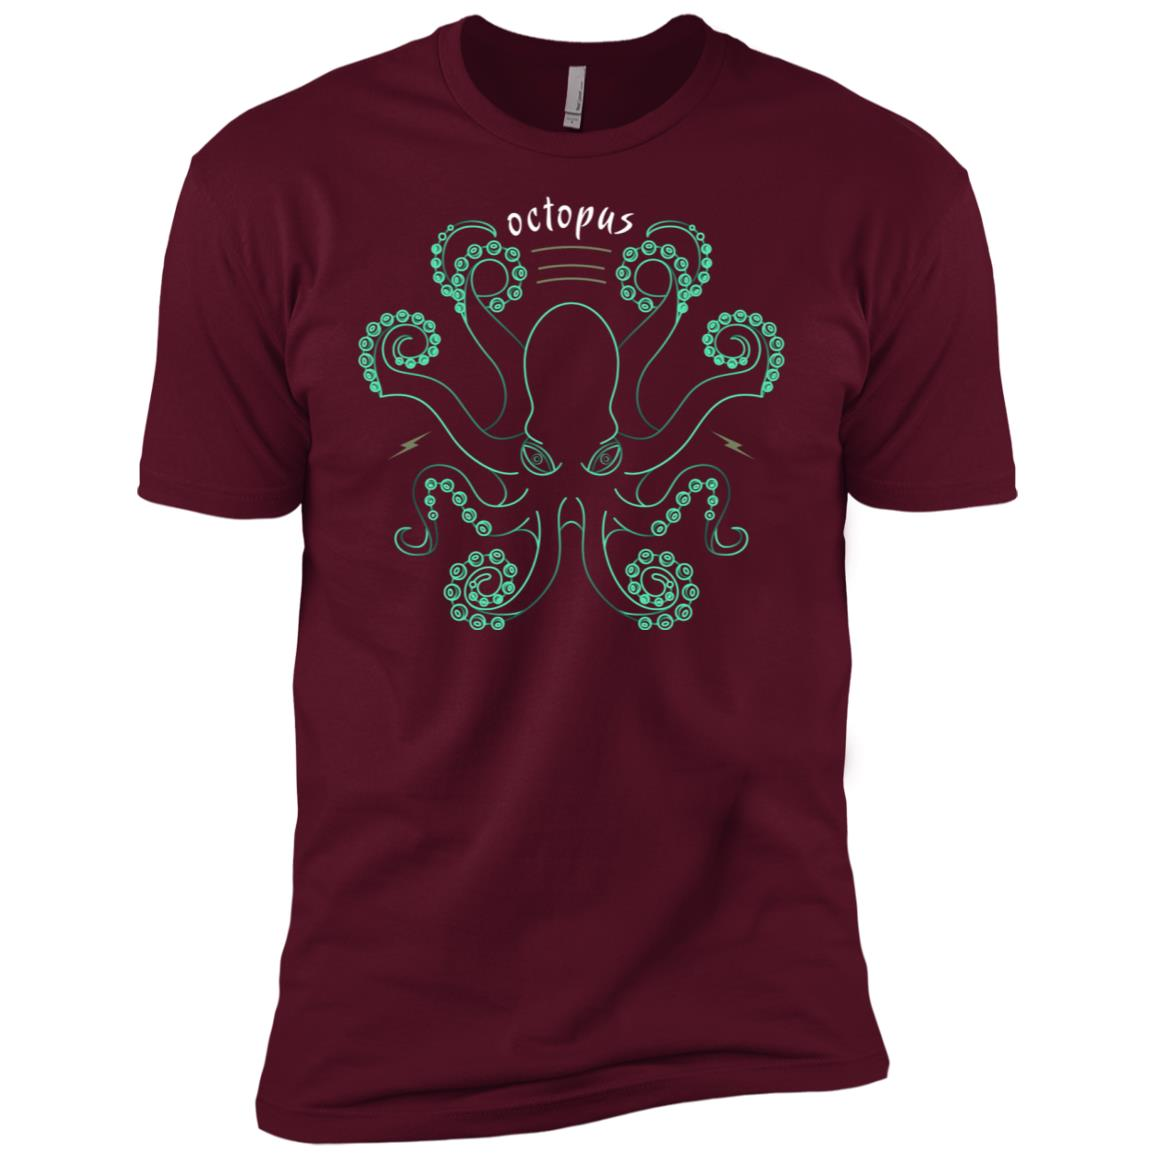 Ls Octopus Thin Line Drawing Tentacle Monster Men Short Sleeve T-Shirt